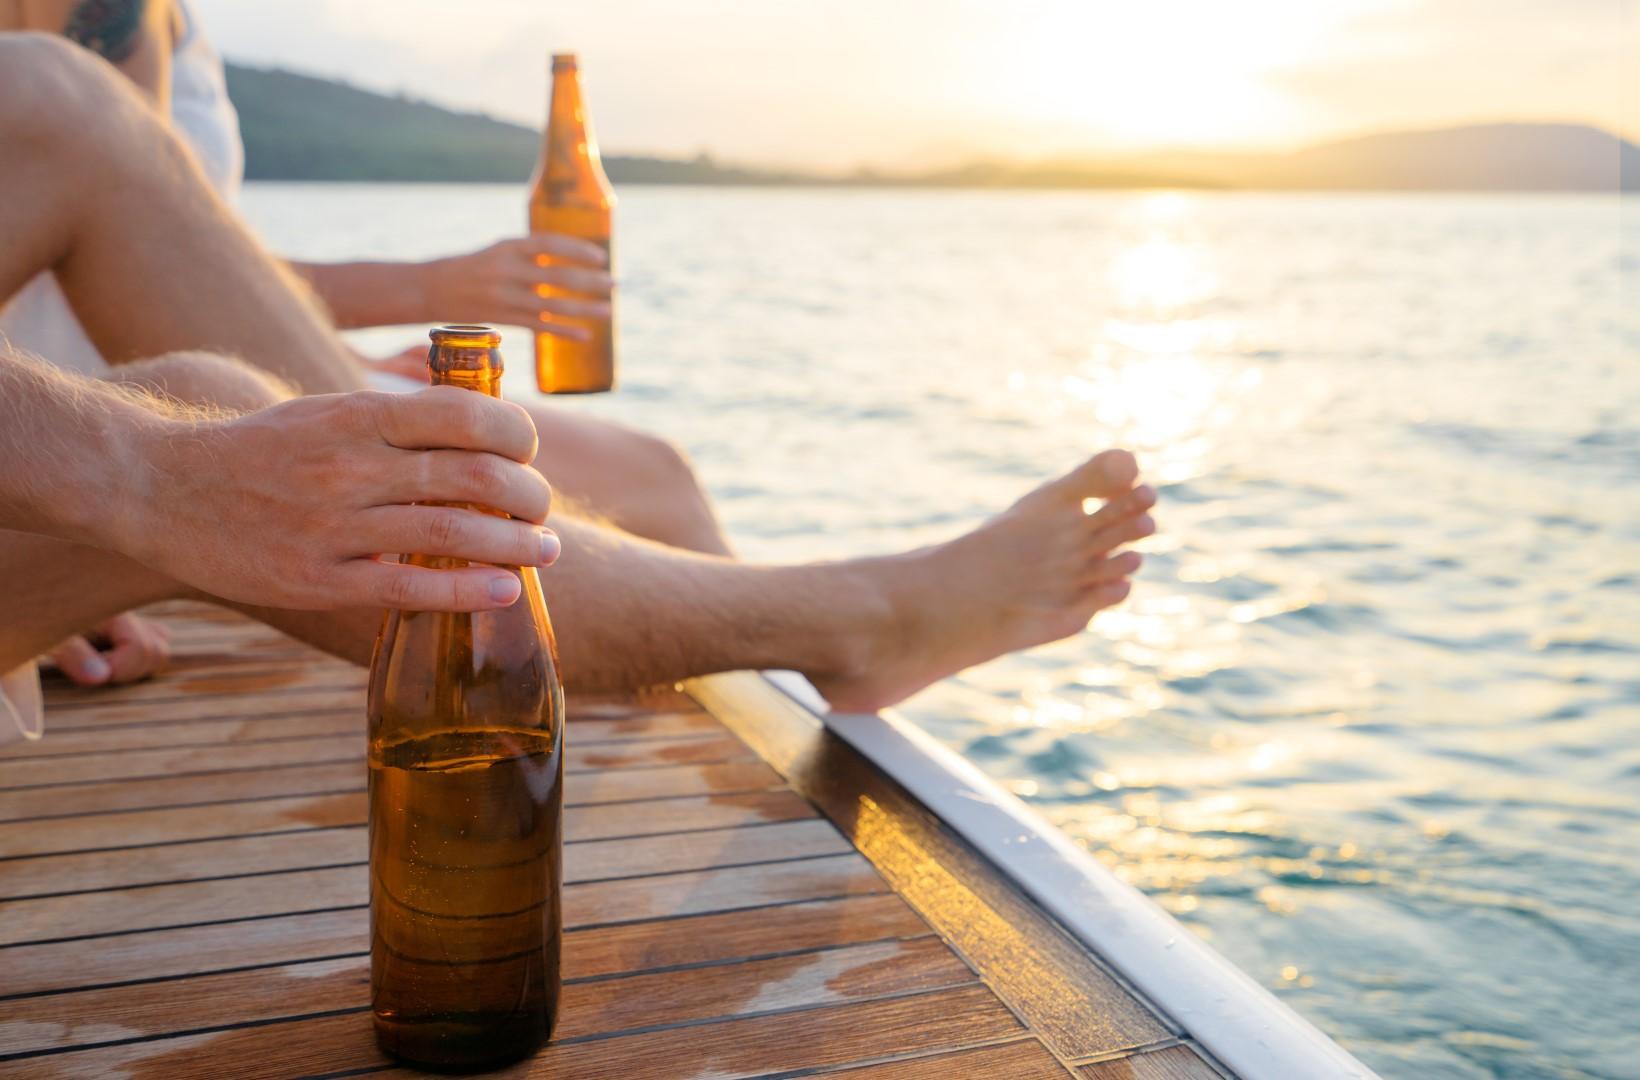 Beer onboard